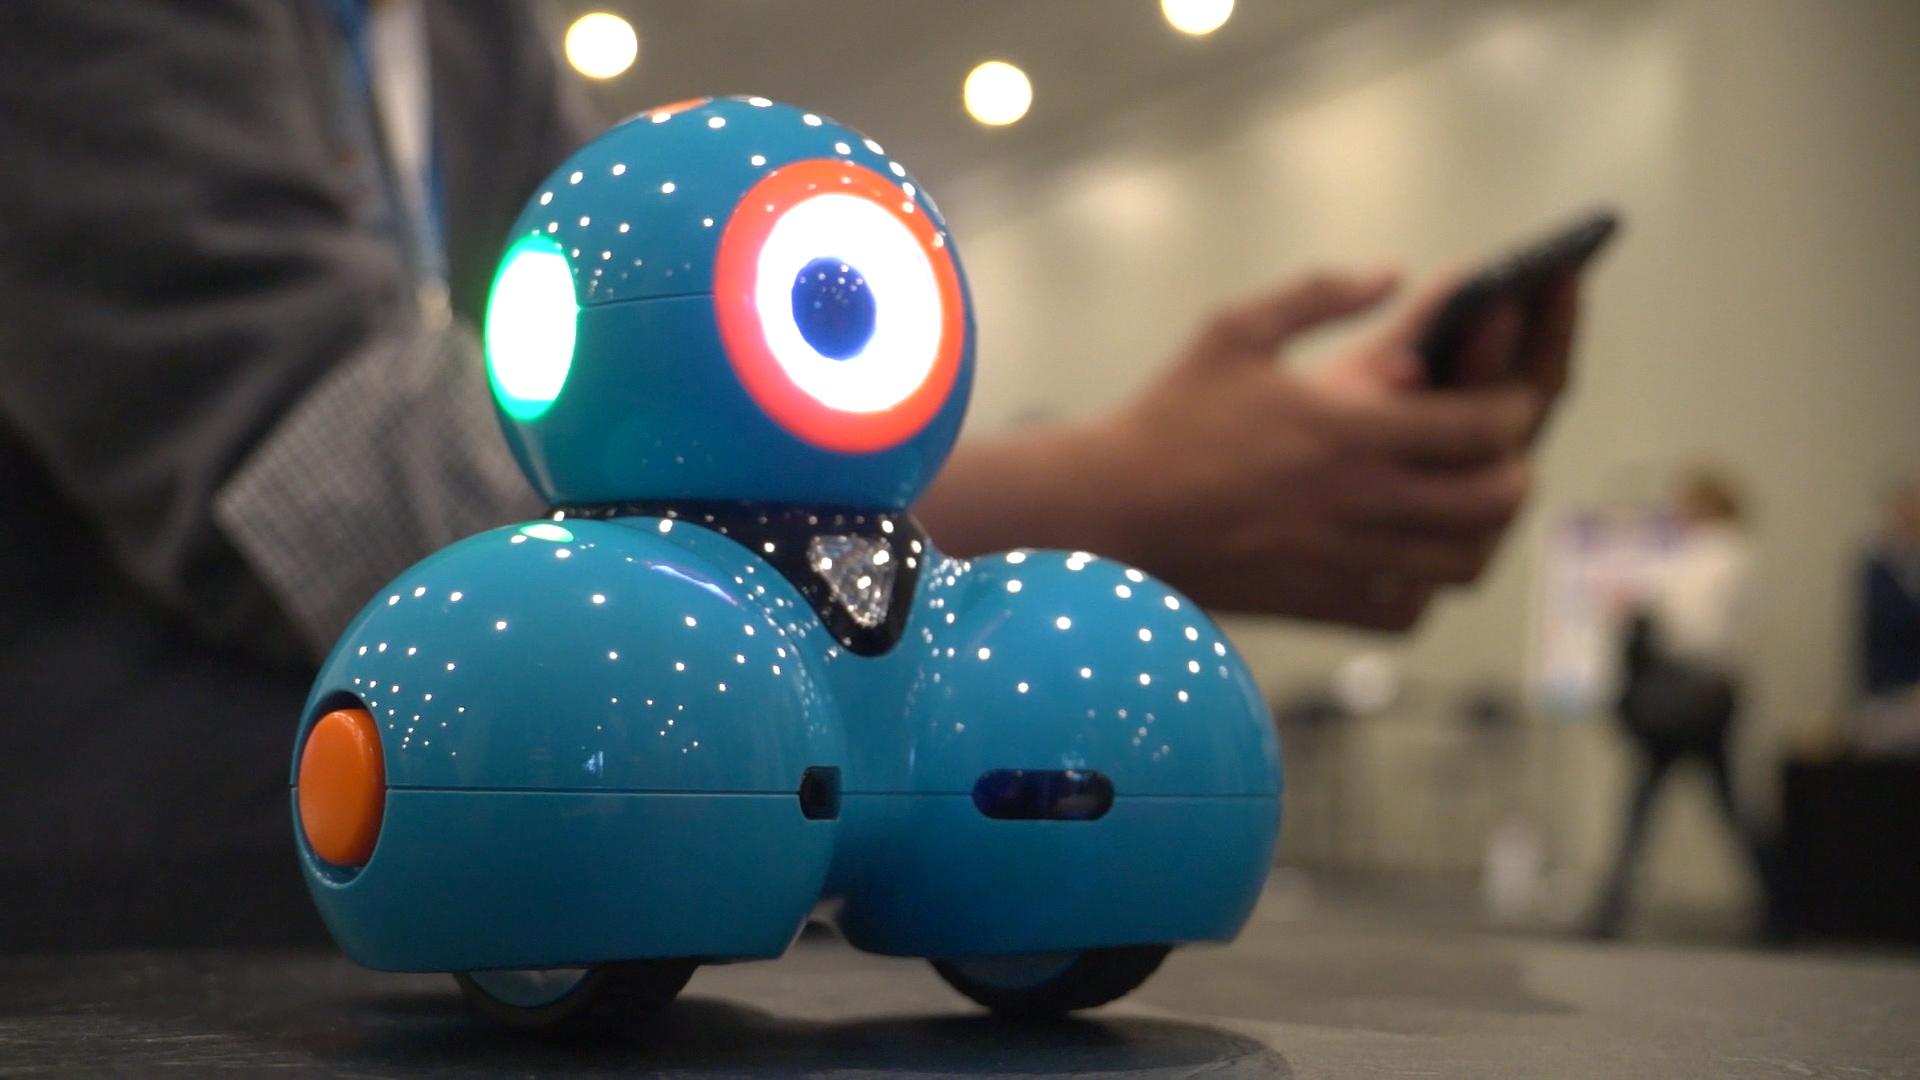 Smart toys help kids prepare for high-tech future - CBS News